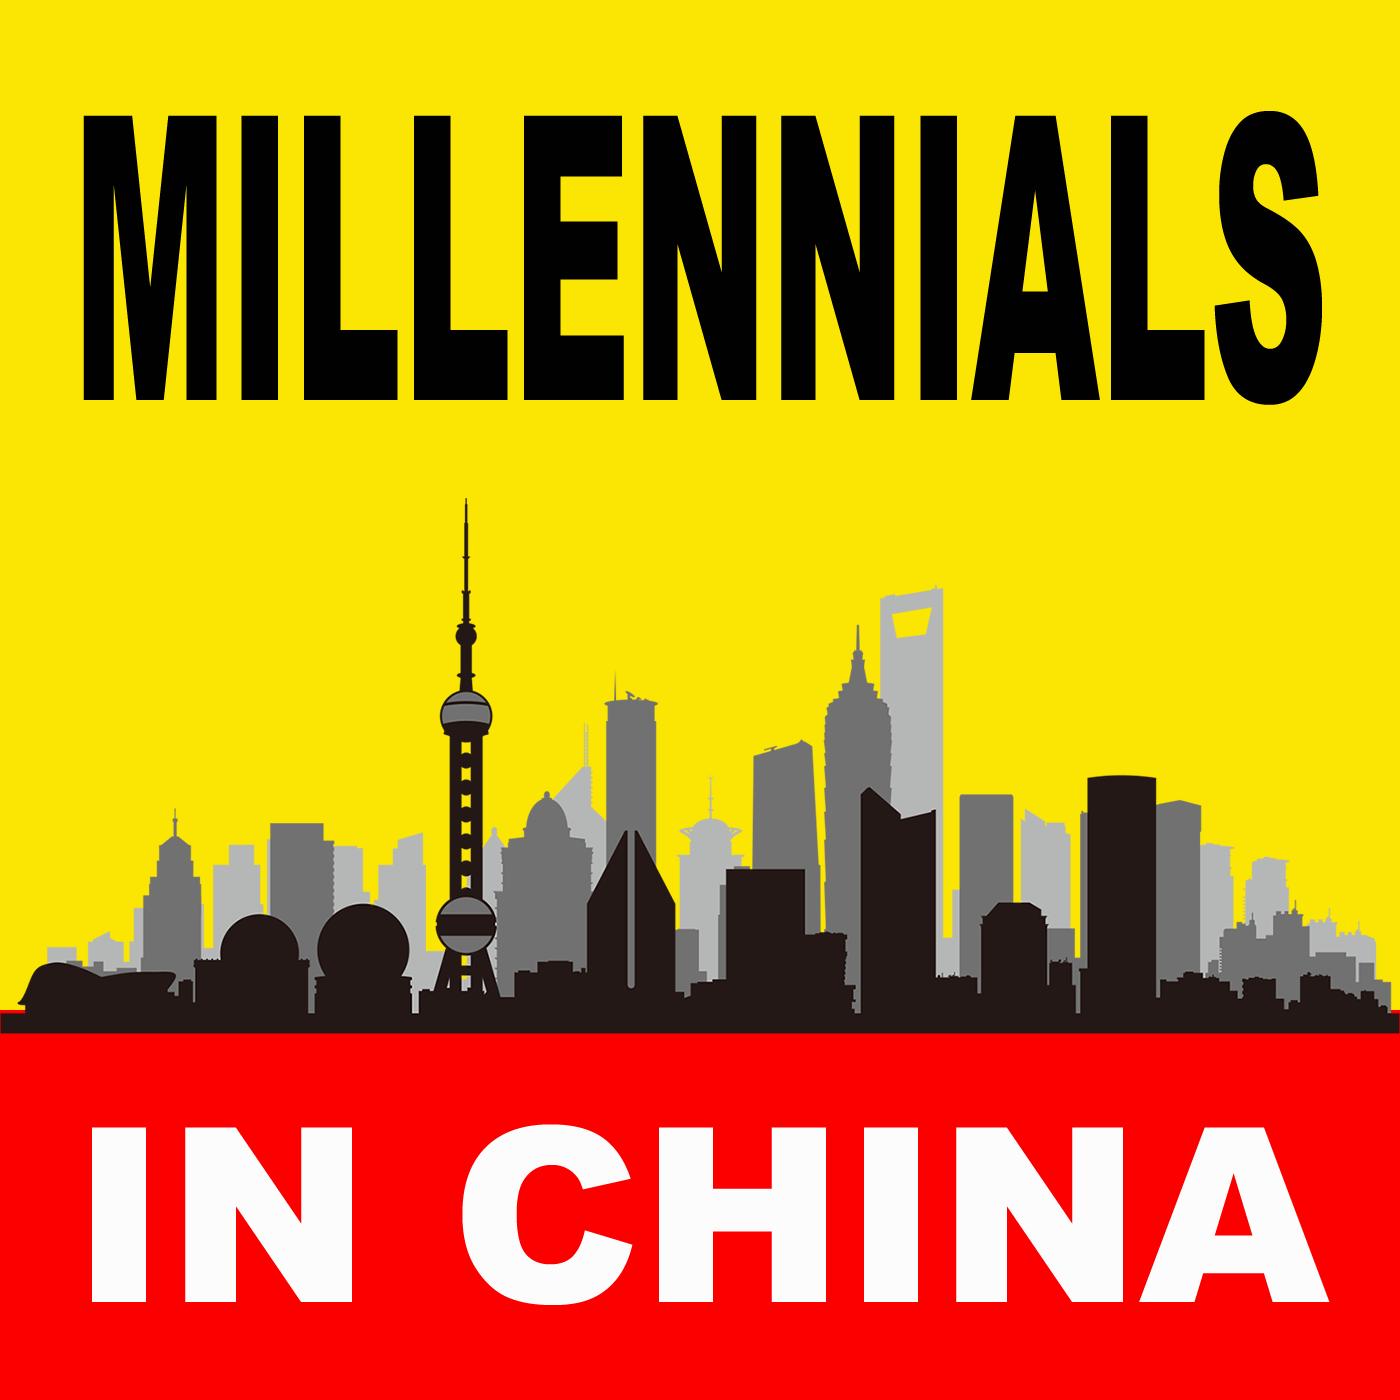 EP23: Bitcoin, the Digital Gold for Millennials